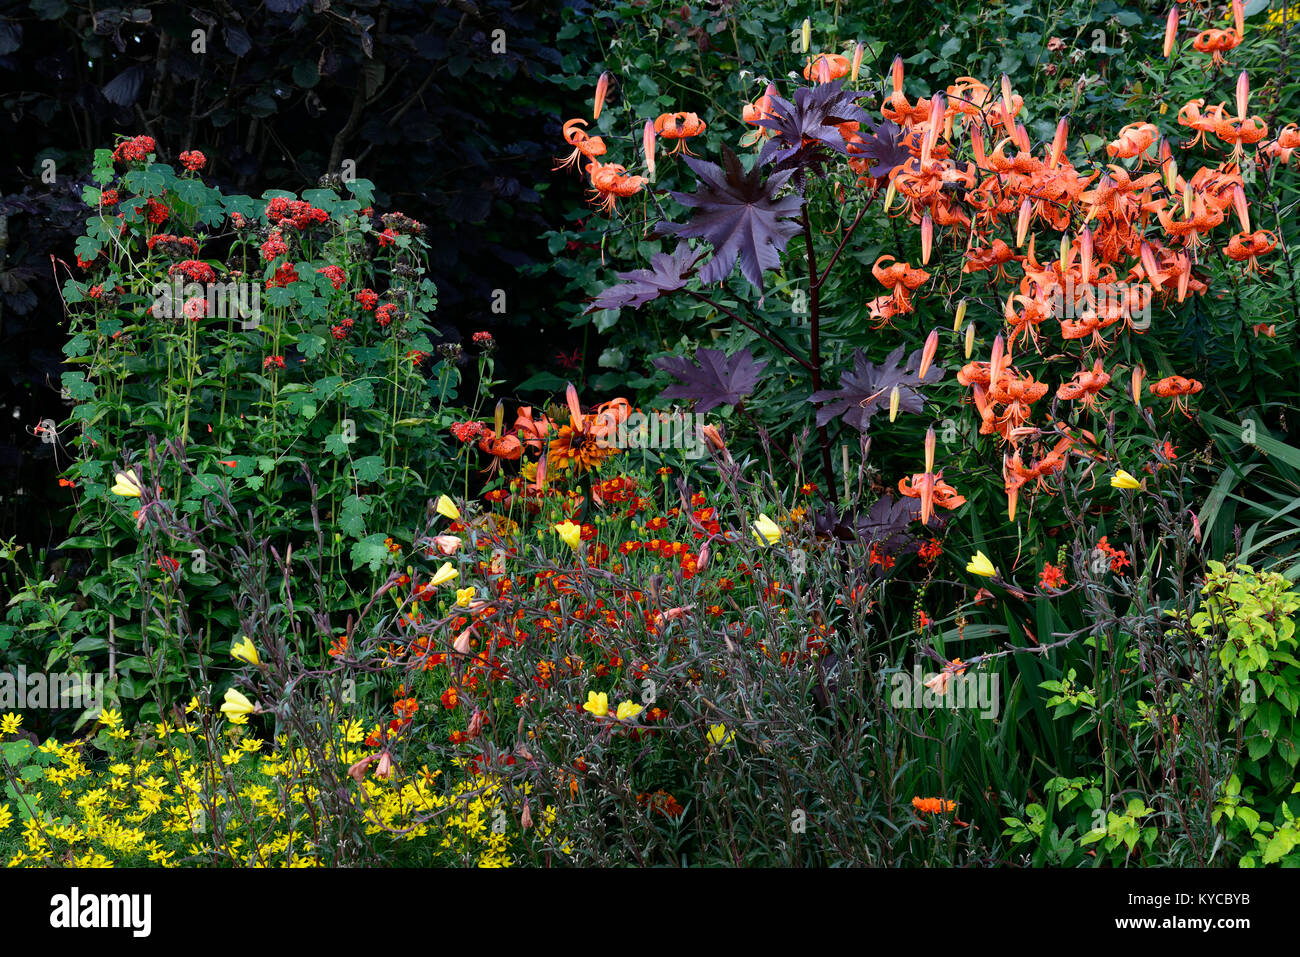 Coreopsis Orange Flowers Stock Photos Coreopsis Orange Flowers